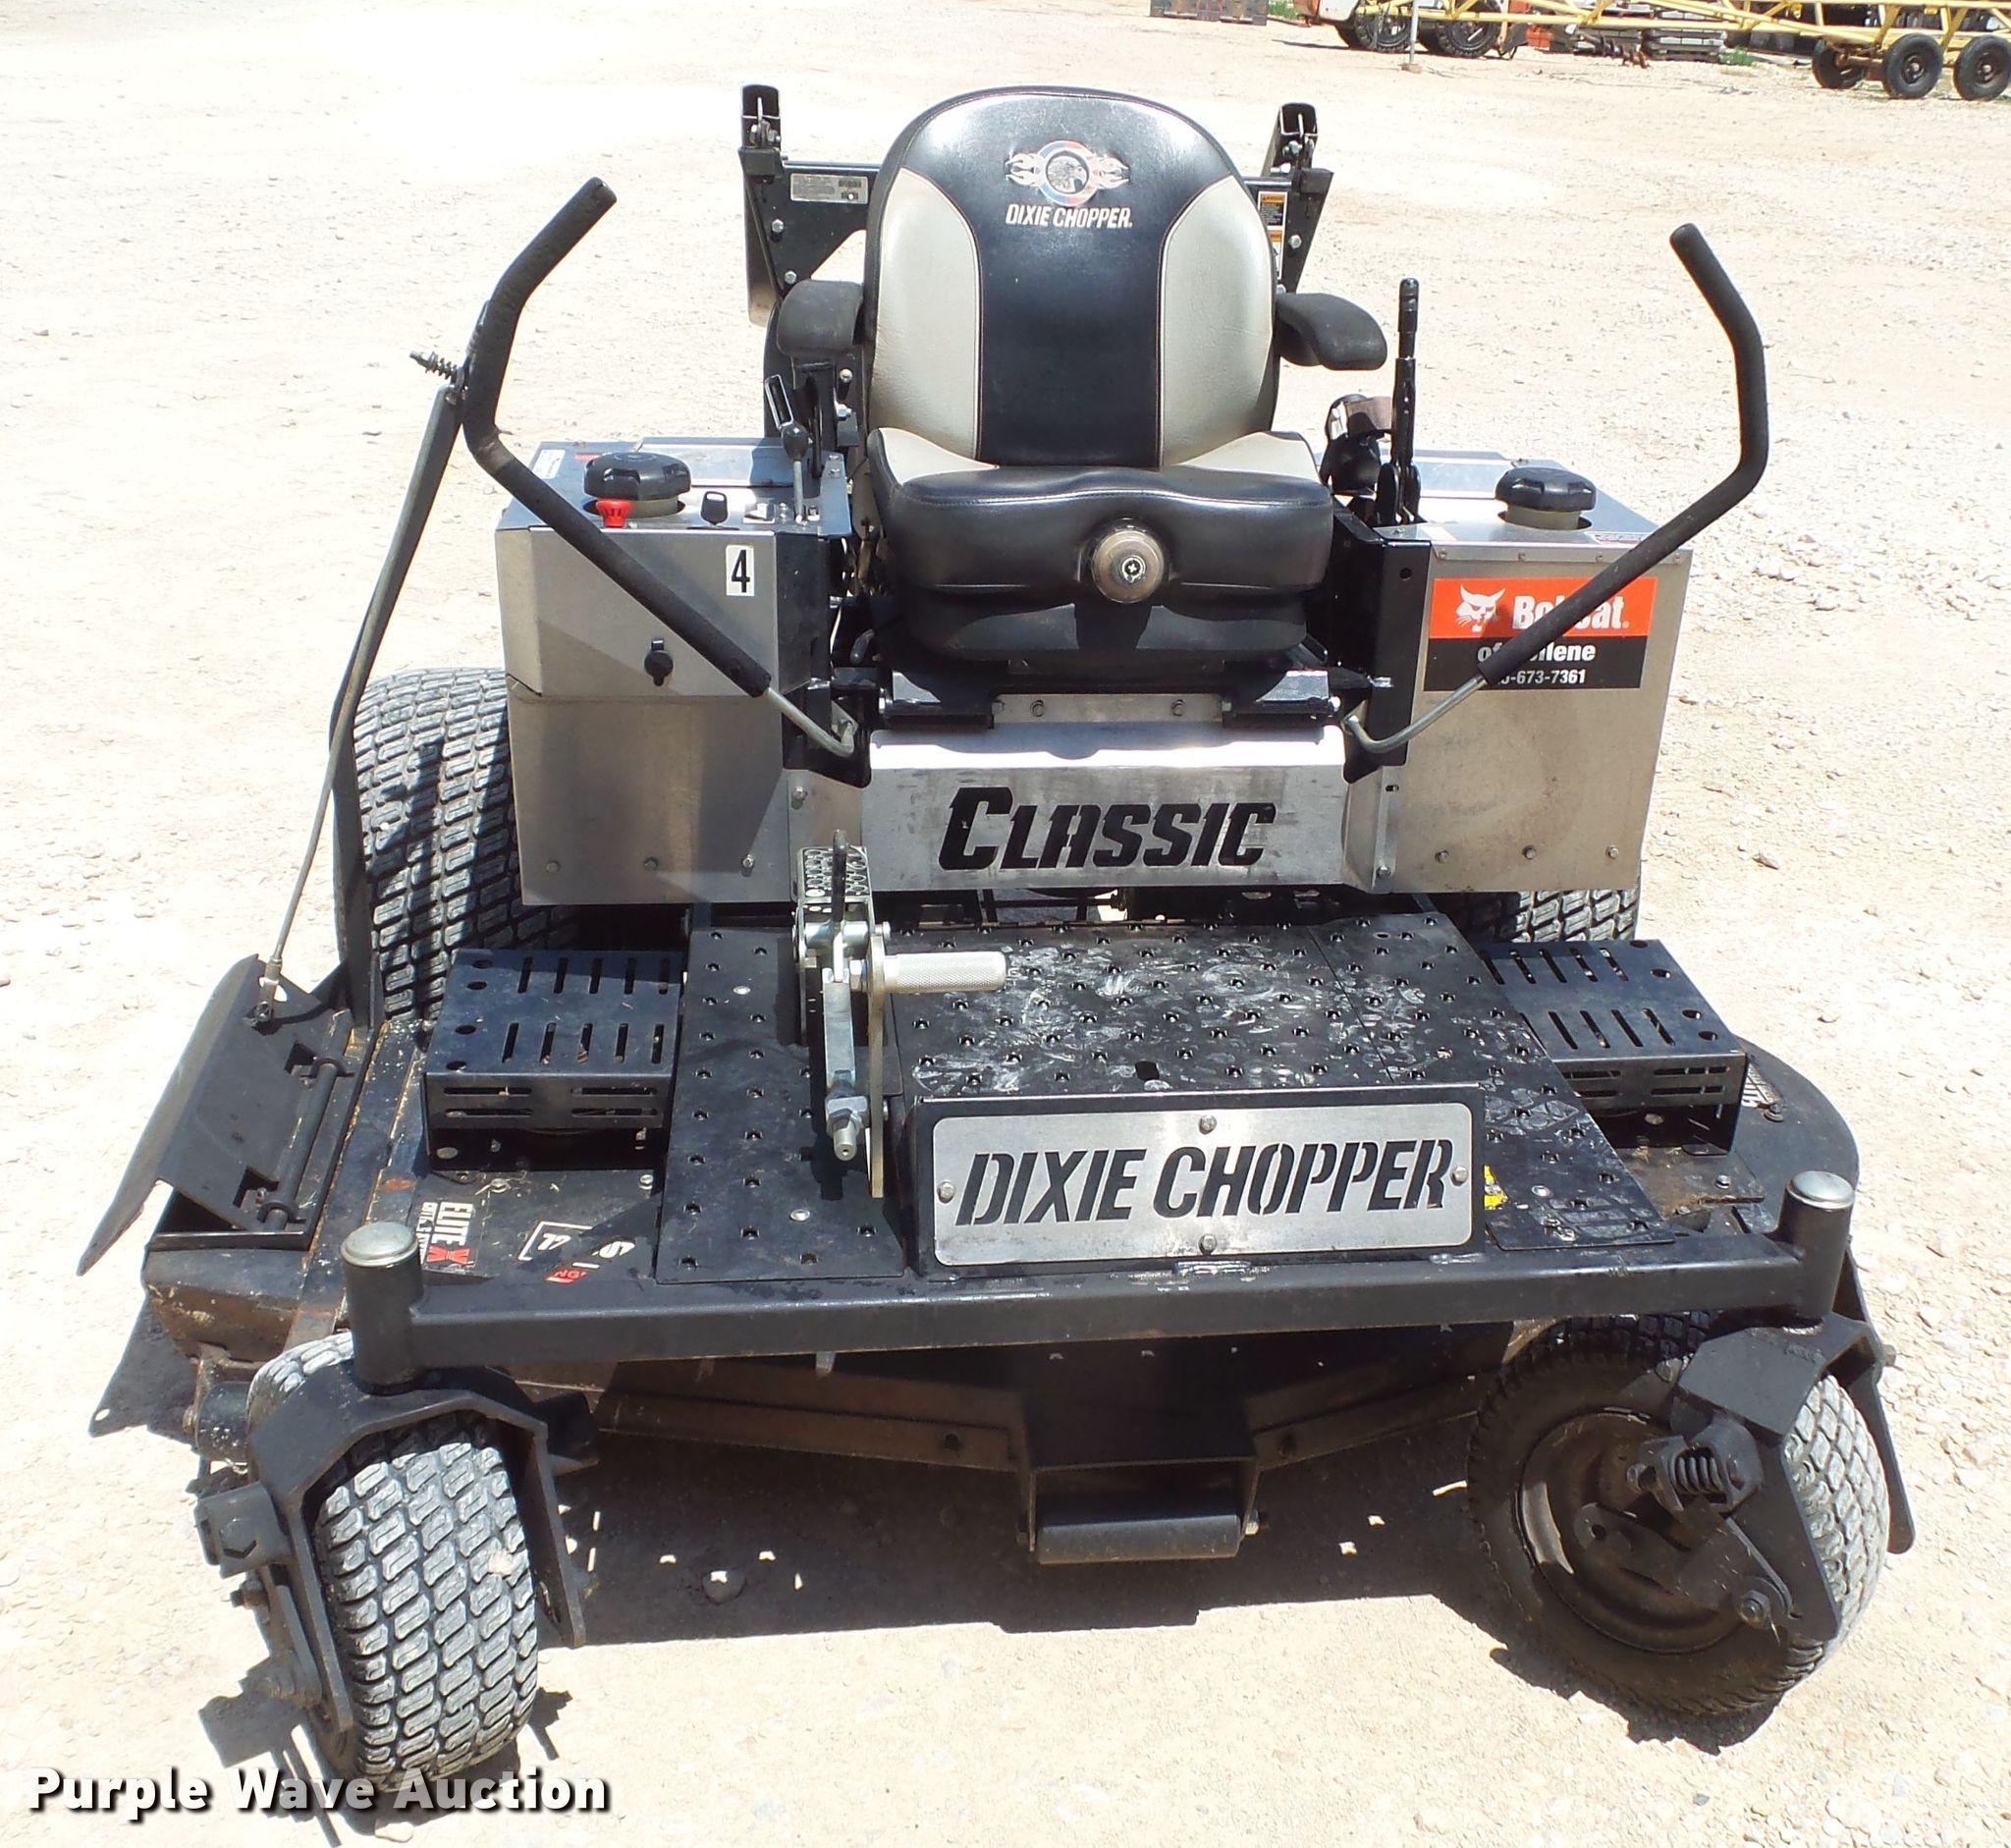 Dixie Chopper Classic ZTR lawn mower | Item FL9268 | Wednesd